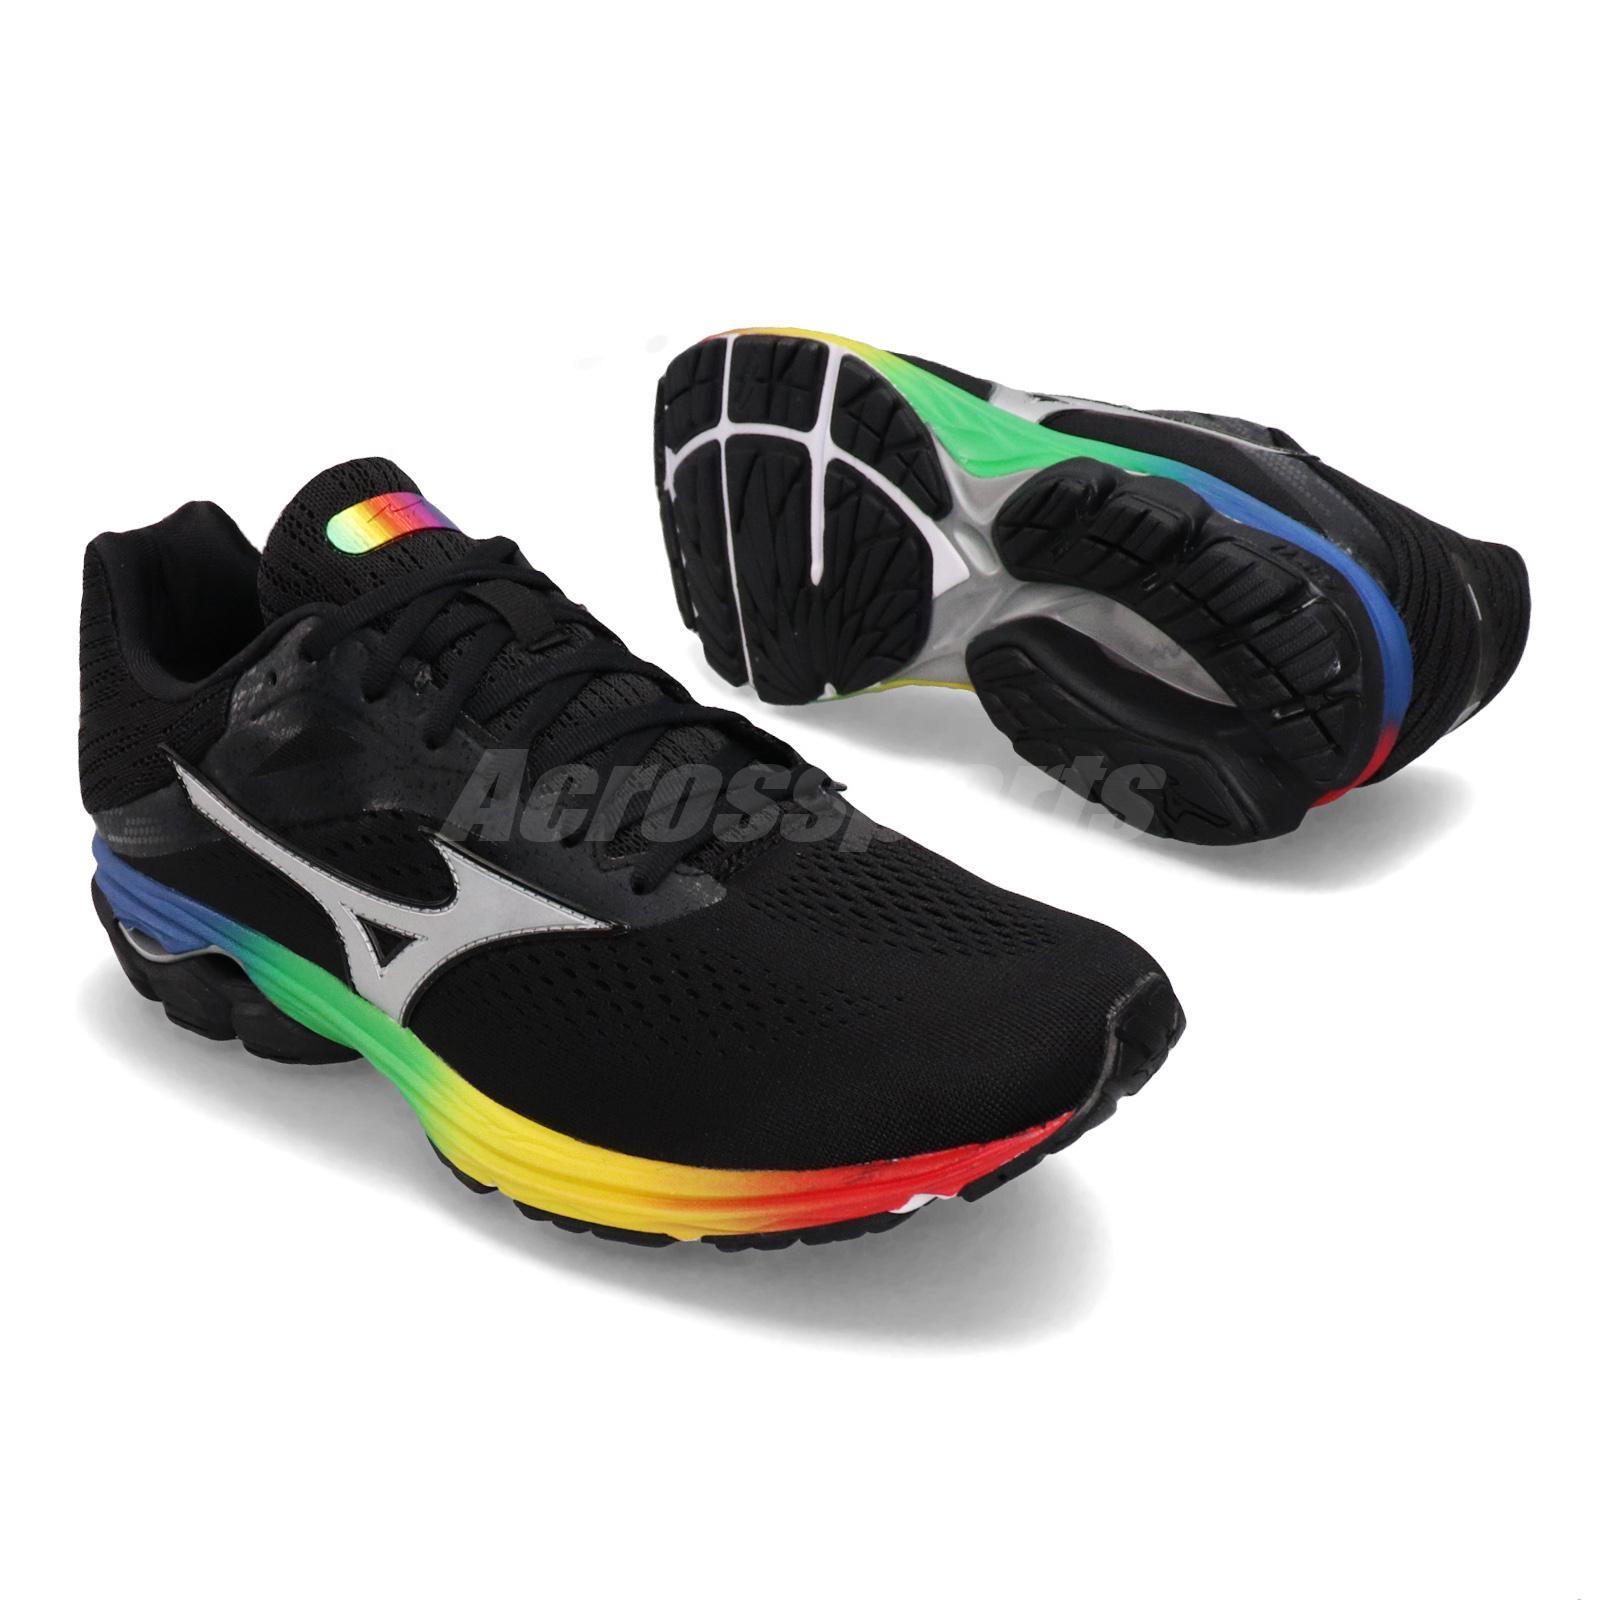 cheap 12% Off Mizuno Wave Rider 17 Mens Running Shoes